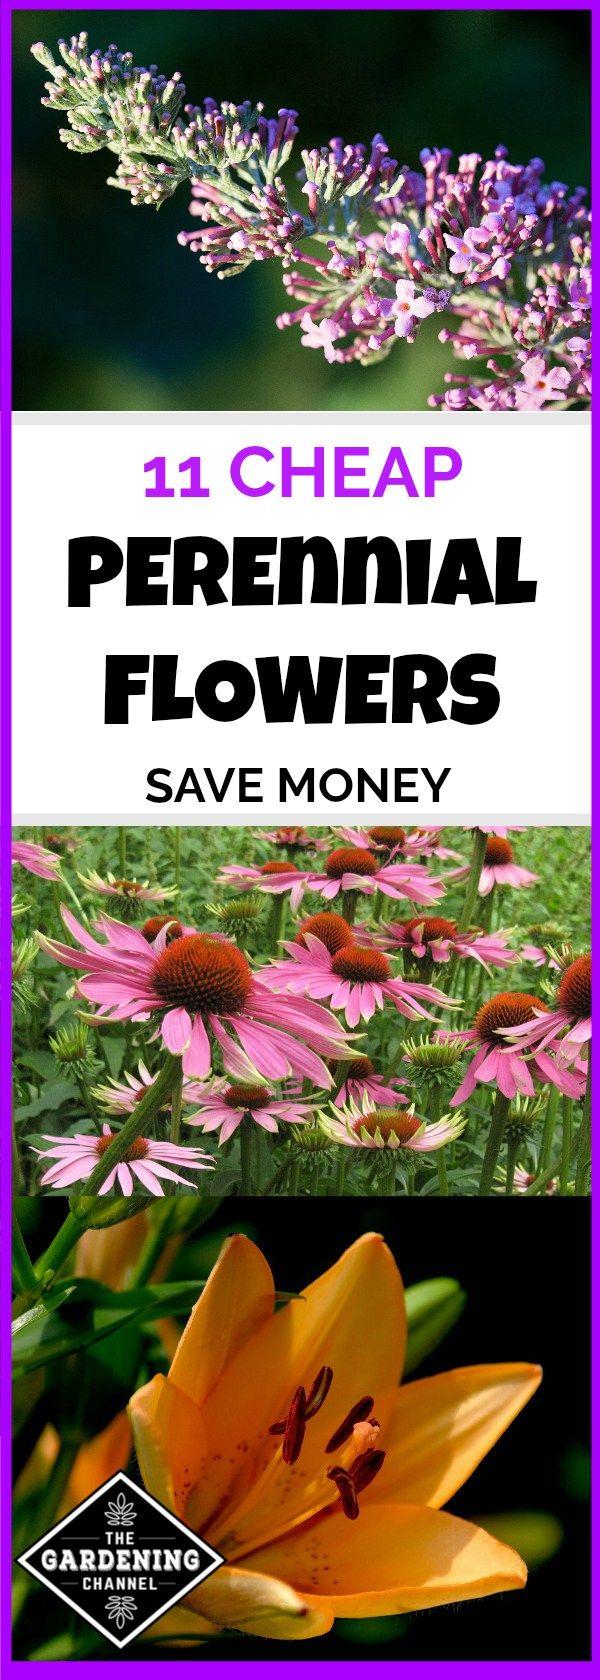 11 cheap perennial flowers for your garden gardening pinterest 11 cheap perennial flowers for your garden gardening pinterest perennials gardens and flower izmirmasajfo